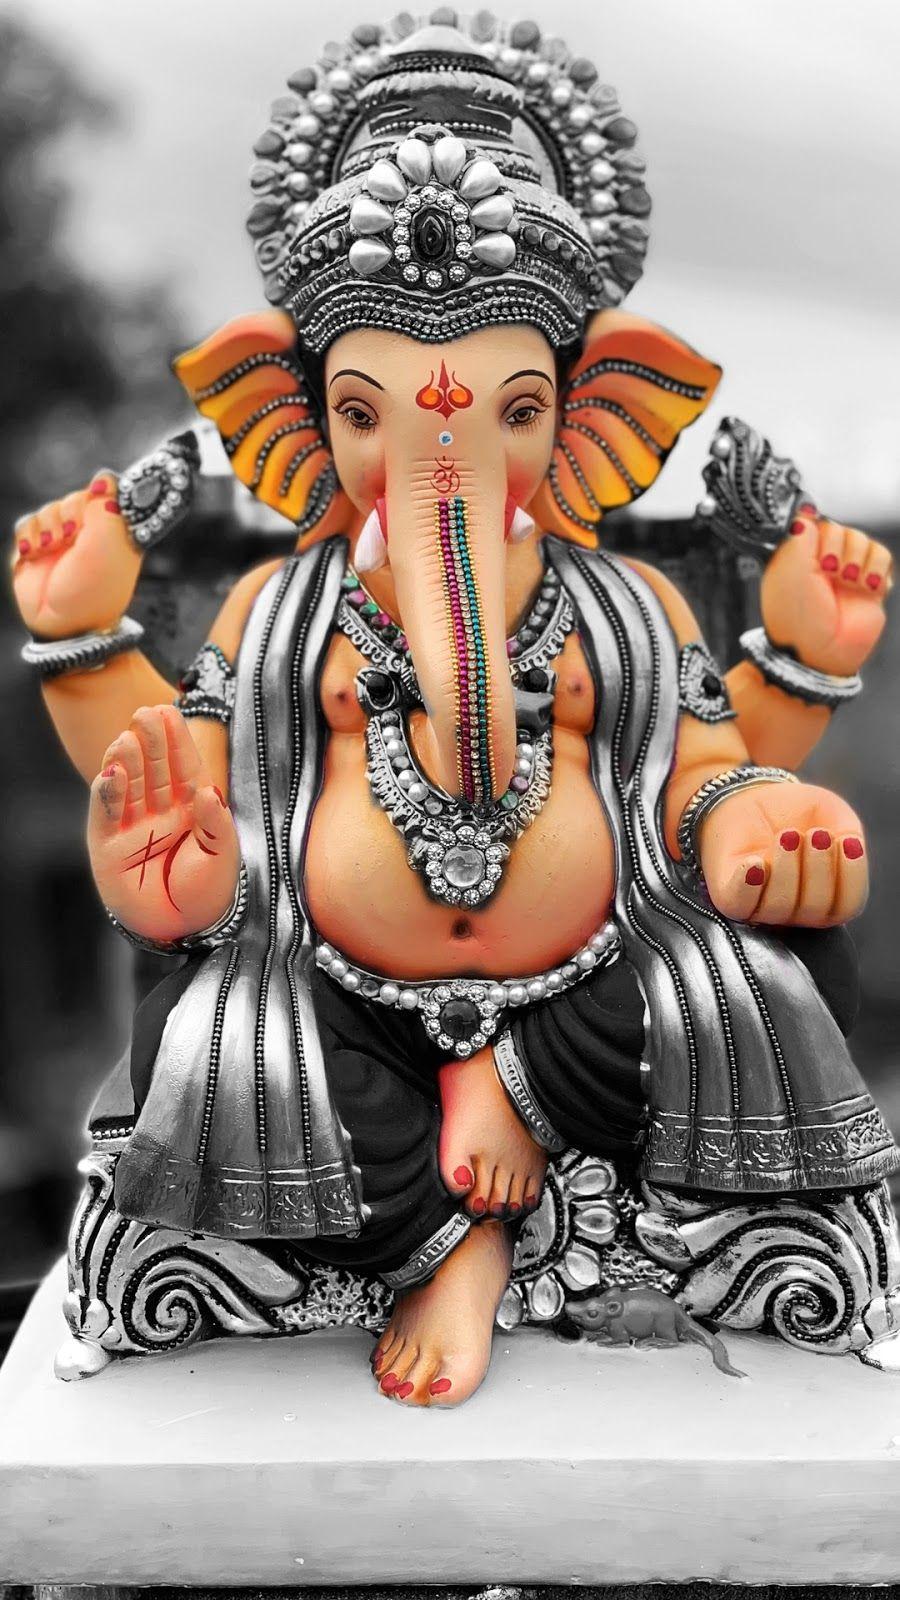 Ganesha Editado Movil Pantalla Dios Indio In 2020 Shivaji Maharaj Hd Wallpaper Lord Murugan Wallpapers Mahadev Hd Wallpaper